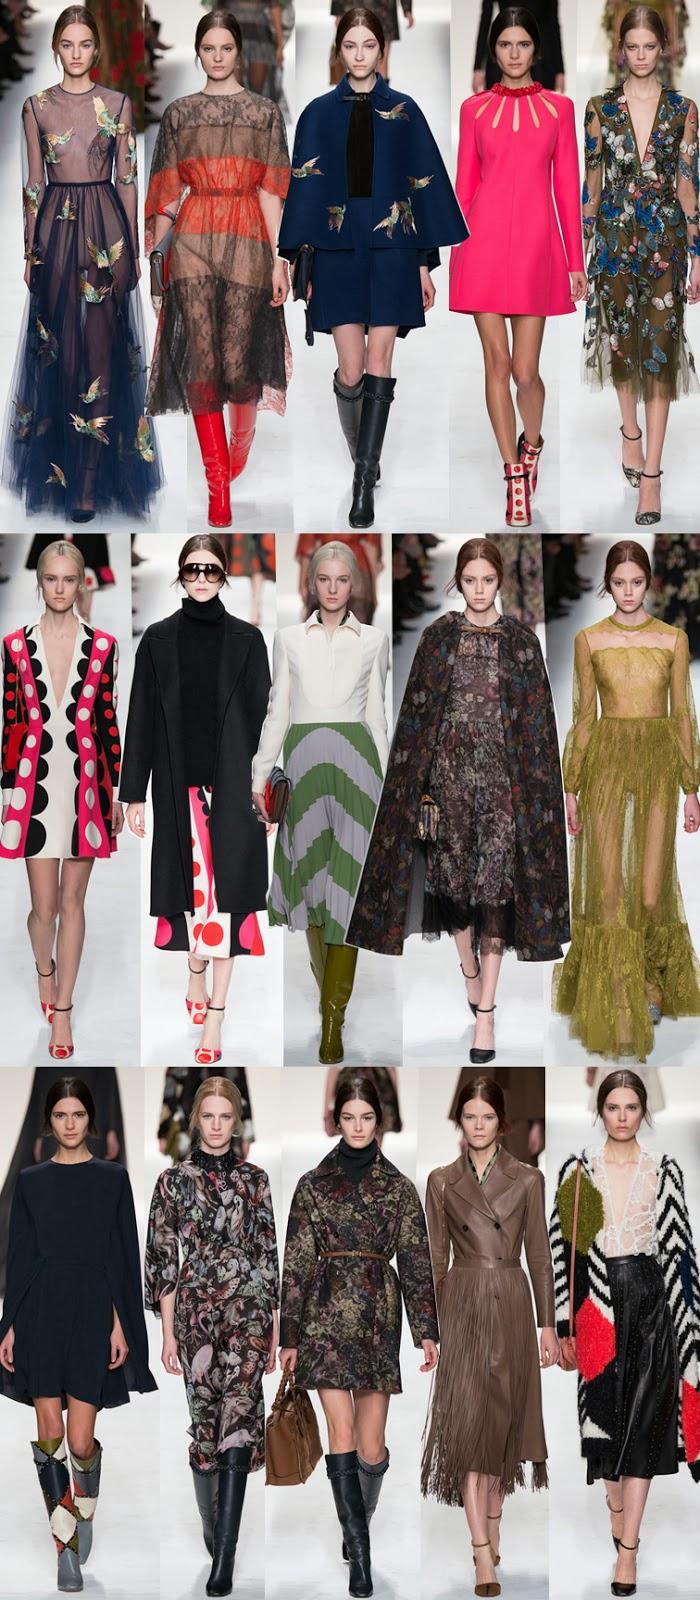 Valentino fall winter 2014 runway collection, PFW, Paris fashion week, FW14, AW14, Mara Grazia Chiuri, Pier Paolo Piccioli